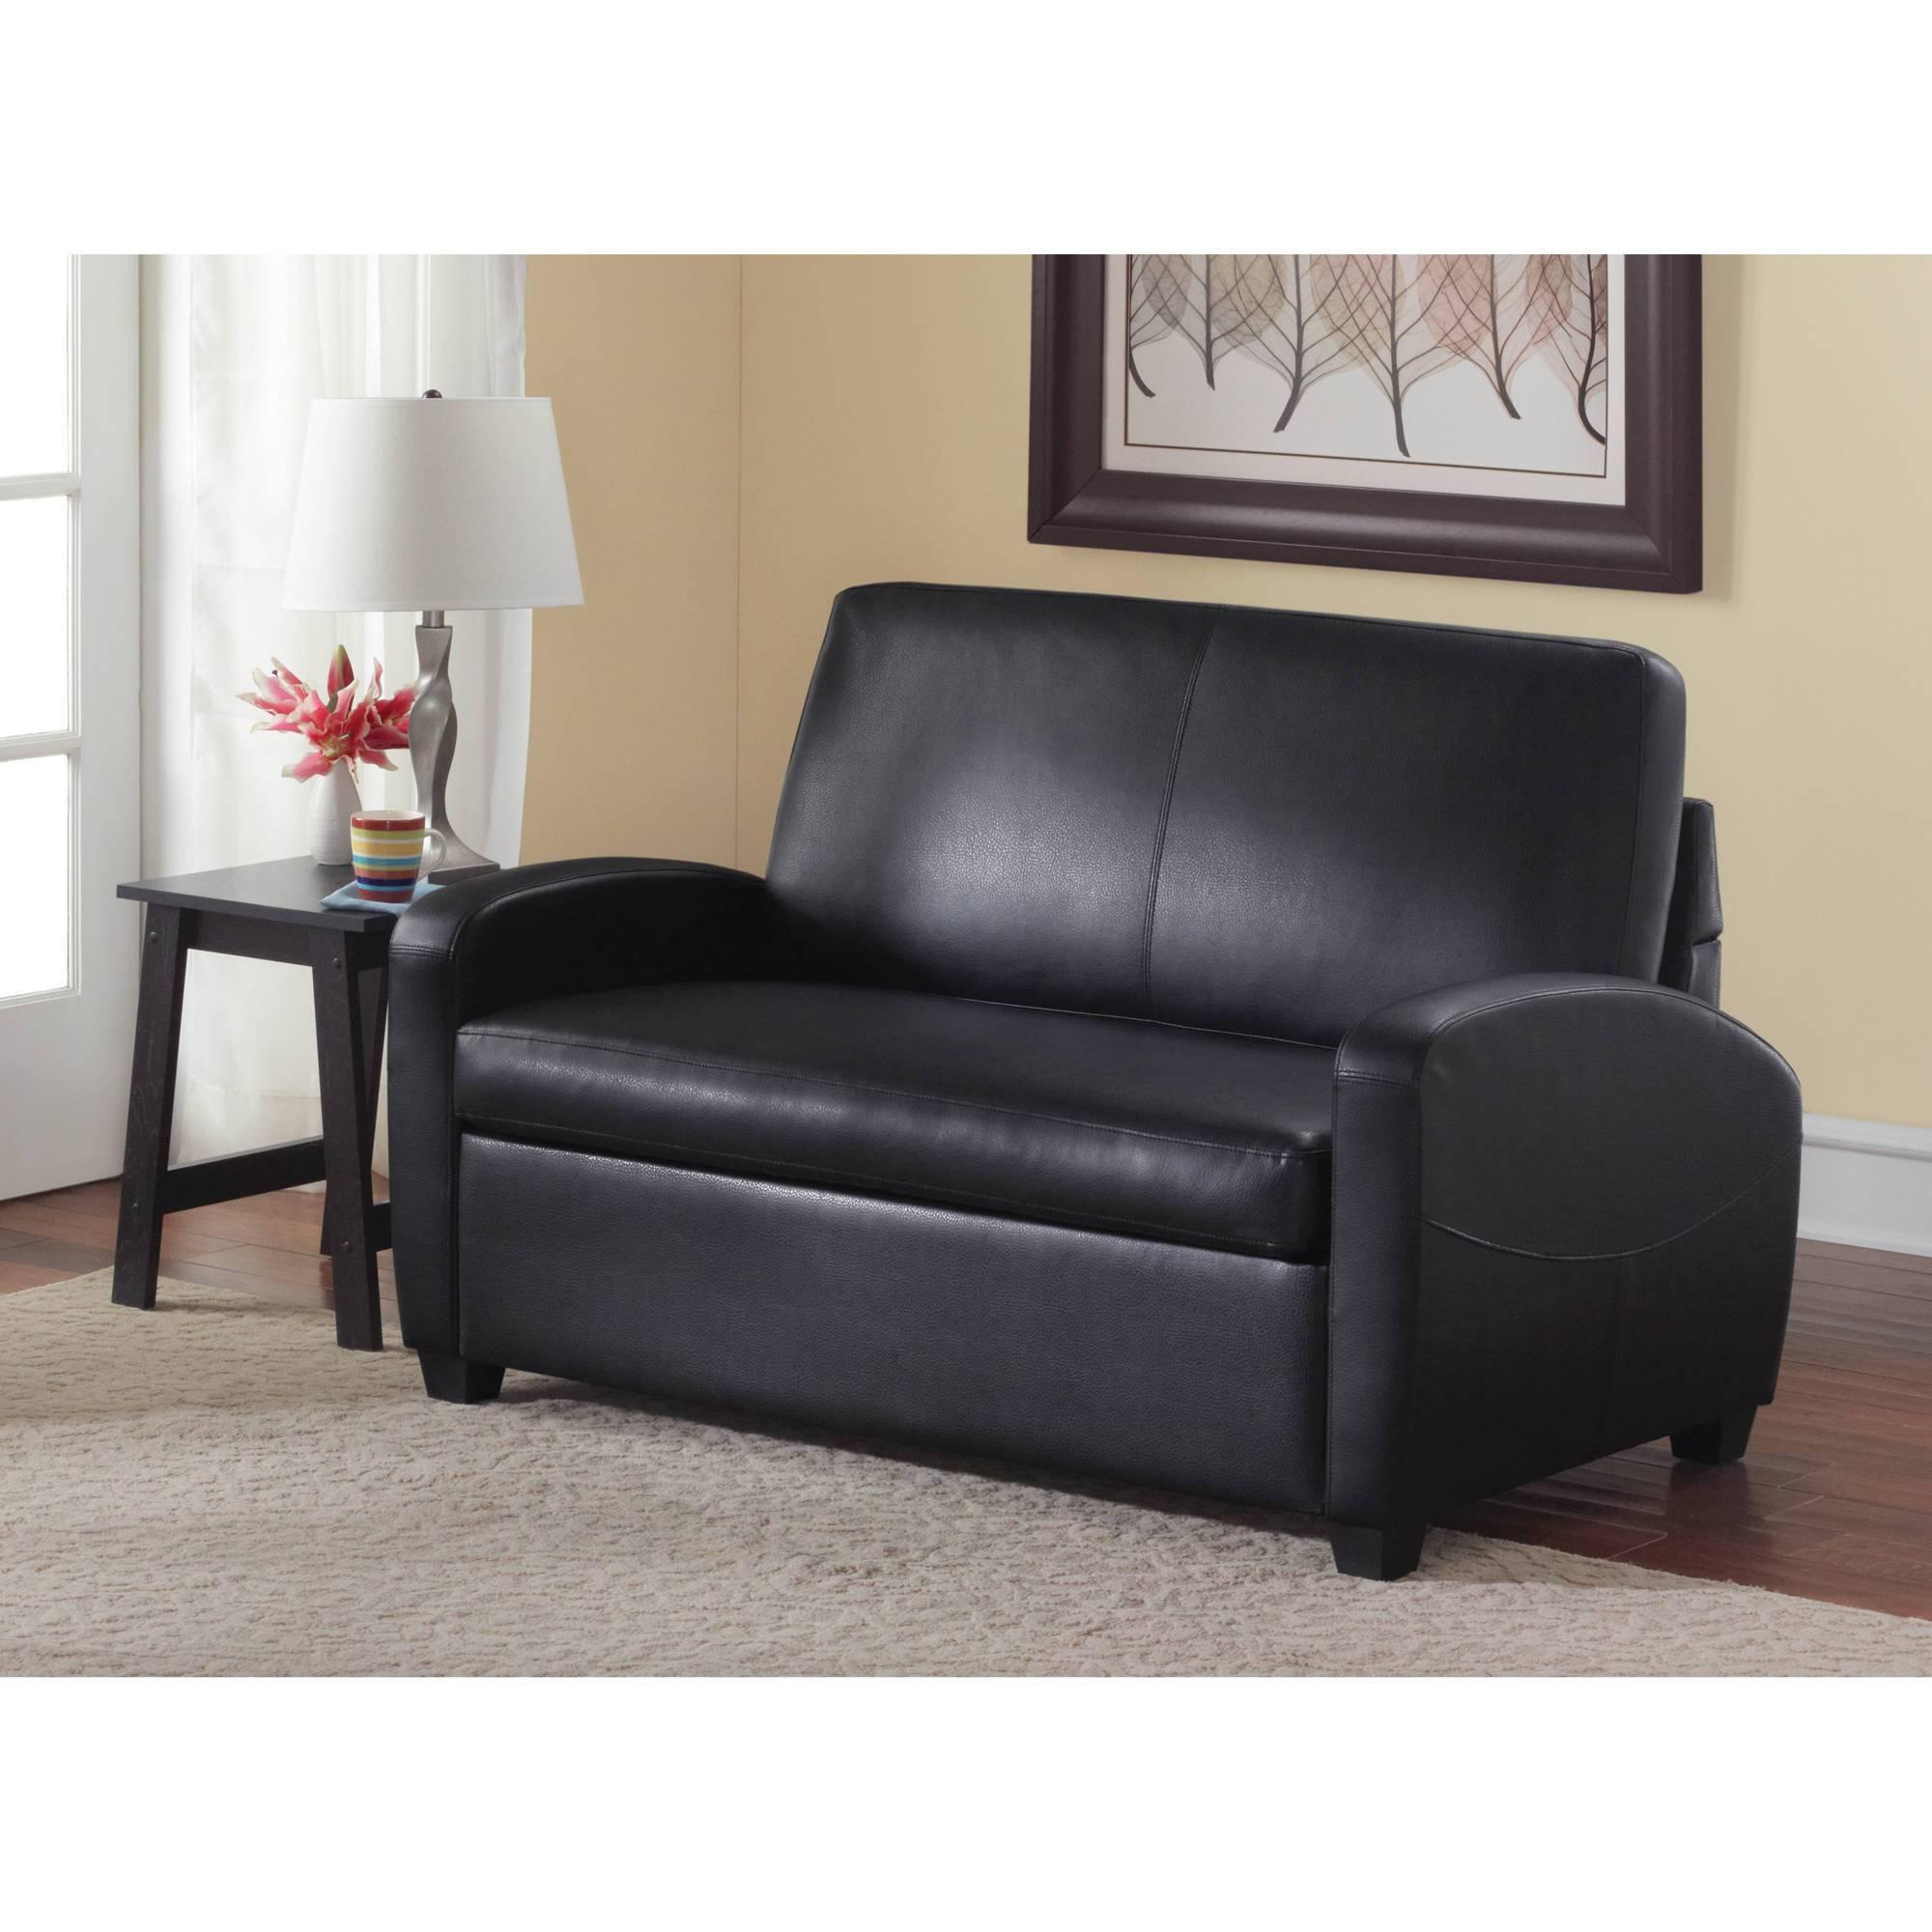 Mainstays Sofa Sleeper, Black - Walmart throughout Wallmart Sofa (Image 22 of 25)